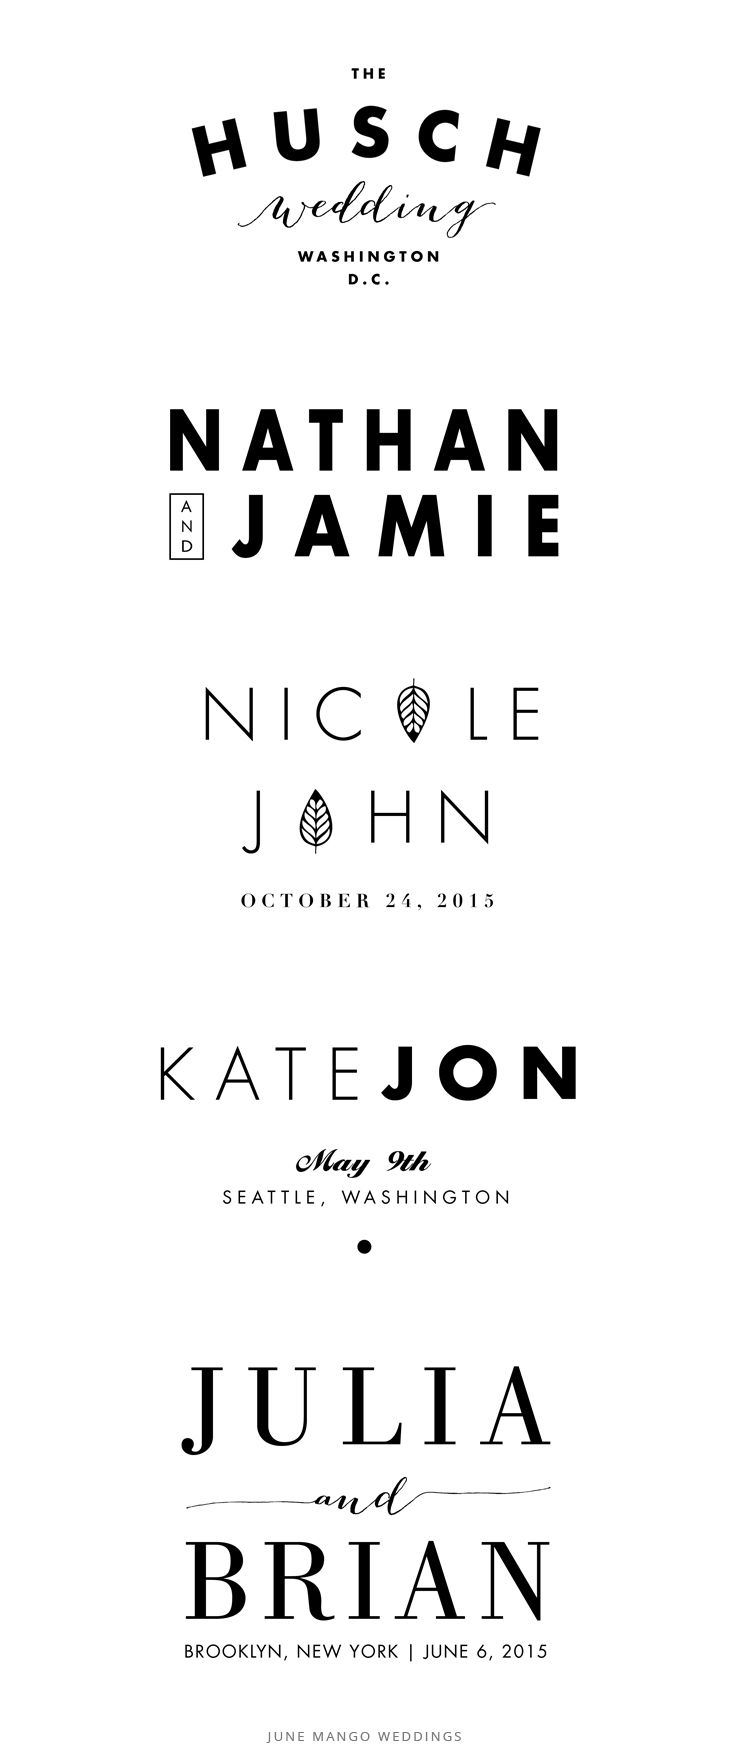 Modern + Simple + Stylish Wedding Logos for couples on Etsy | June Mango Weddings